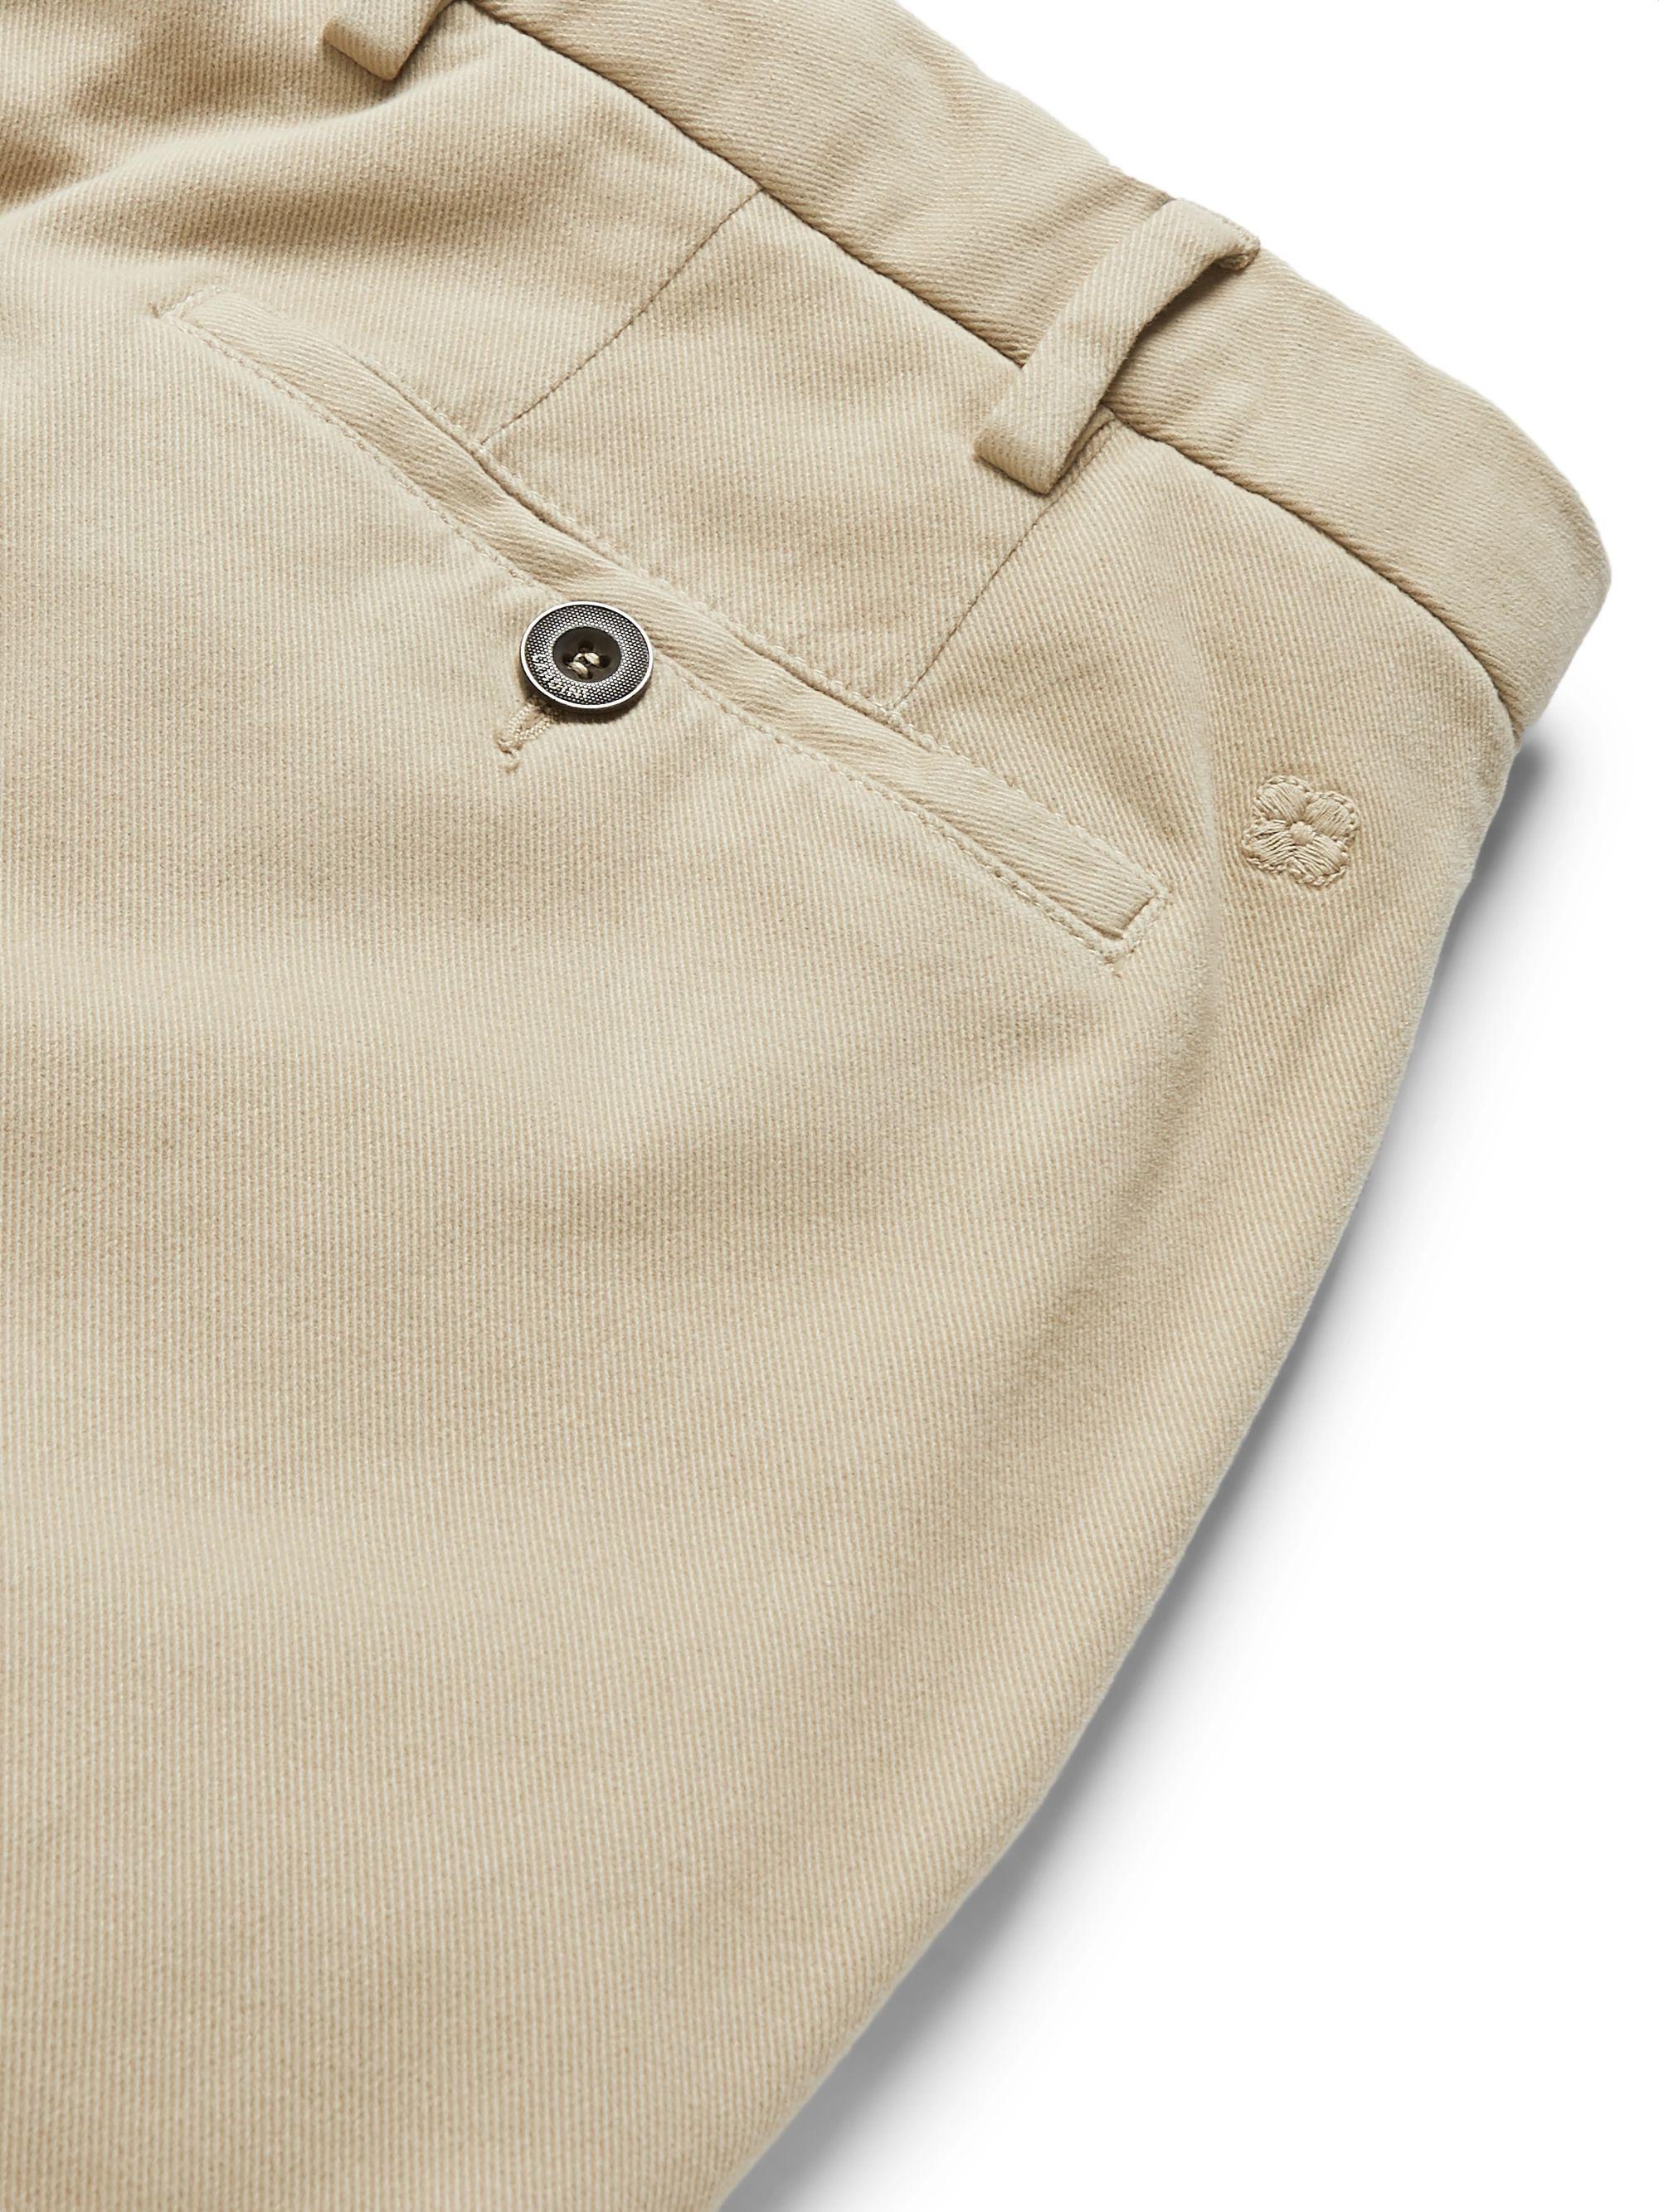 Beige Tapered Garment-dyed Cotton-blend Twill Trousers | Lardini